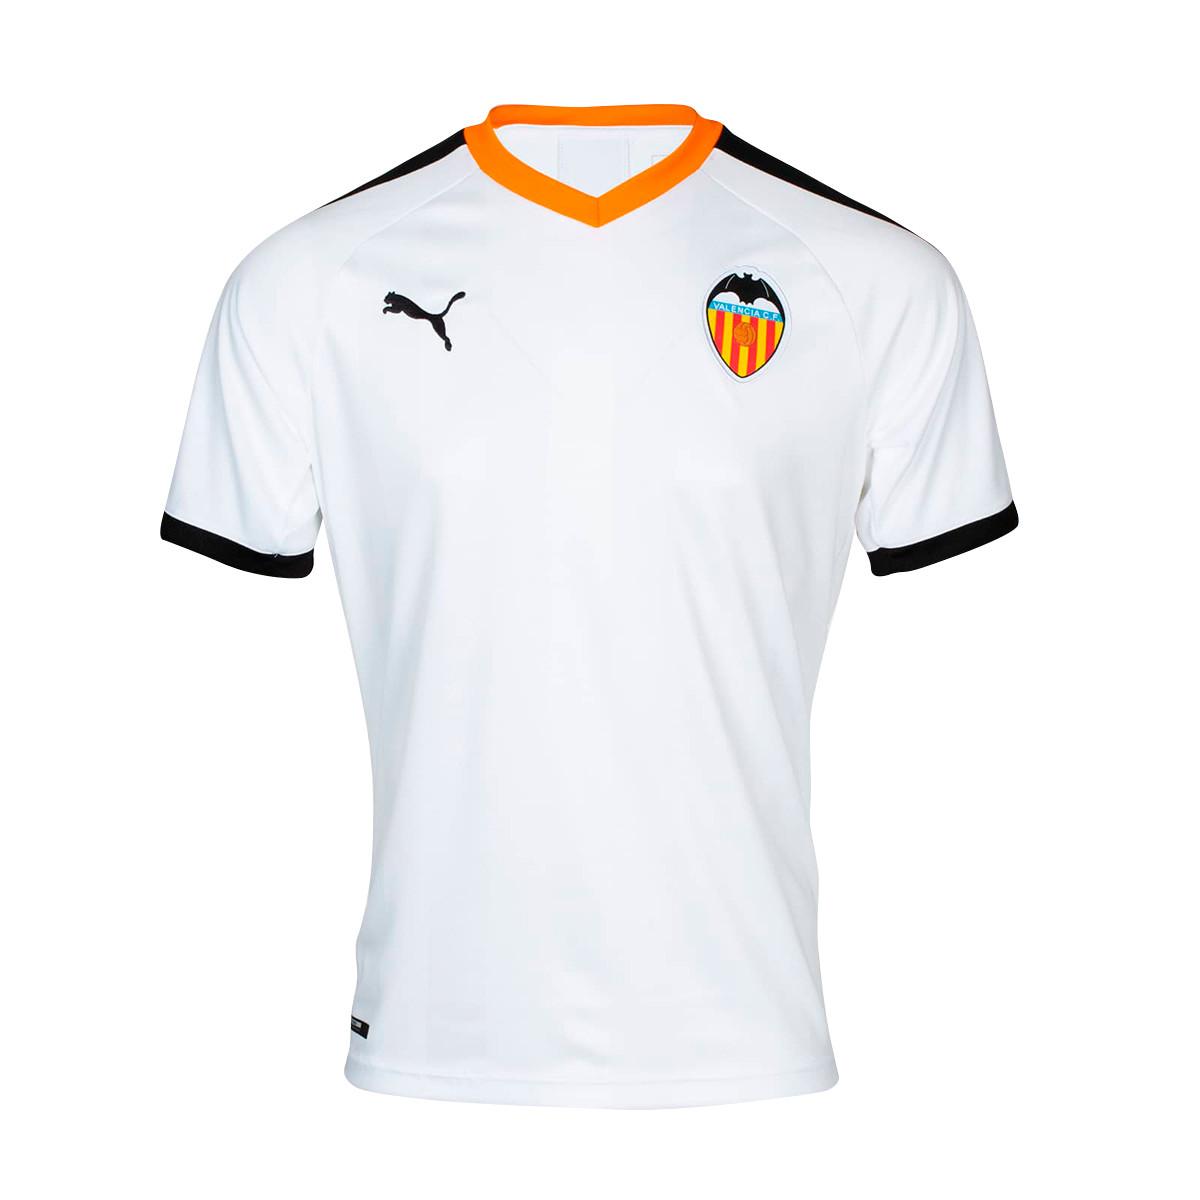 Decir a un lado surco Empleador  Jersey Puma Kids Valencia CF 2019-2020 Home Puma white-Puma black-Vibrant  orange - Football store Fútbol Emotion